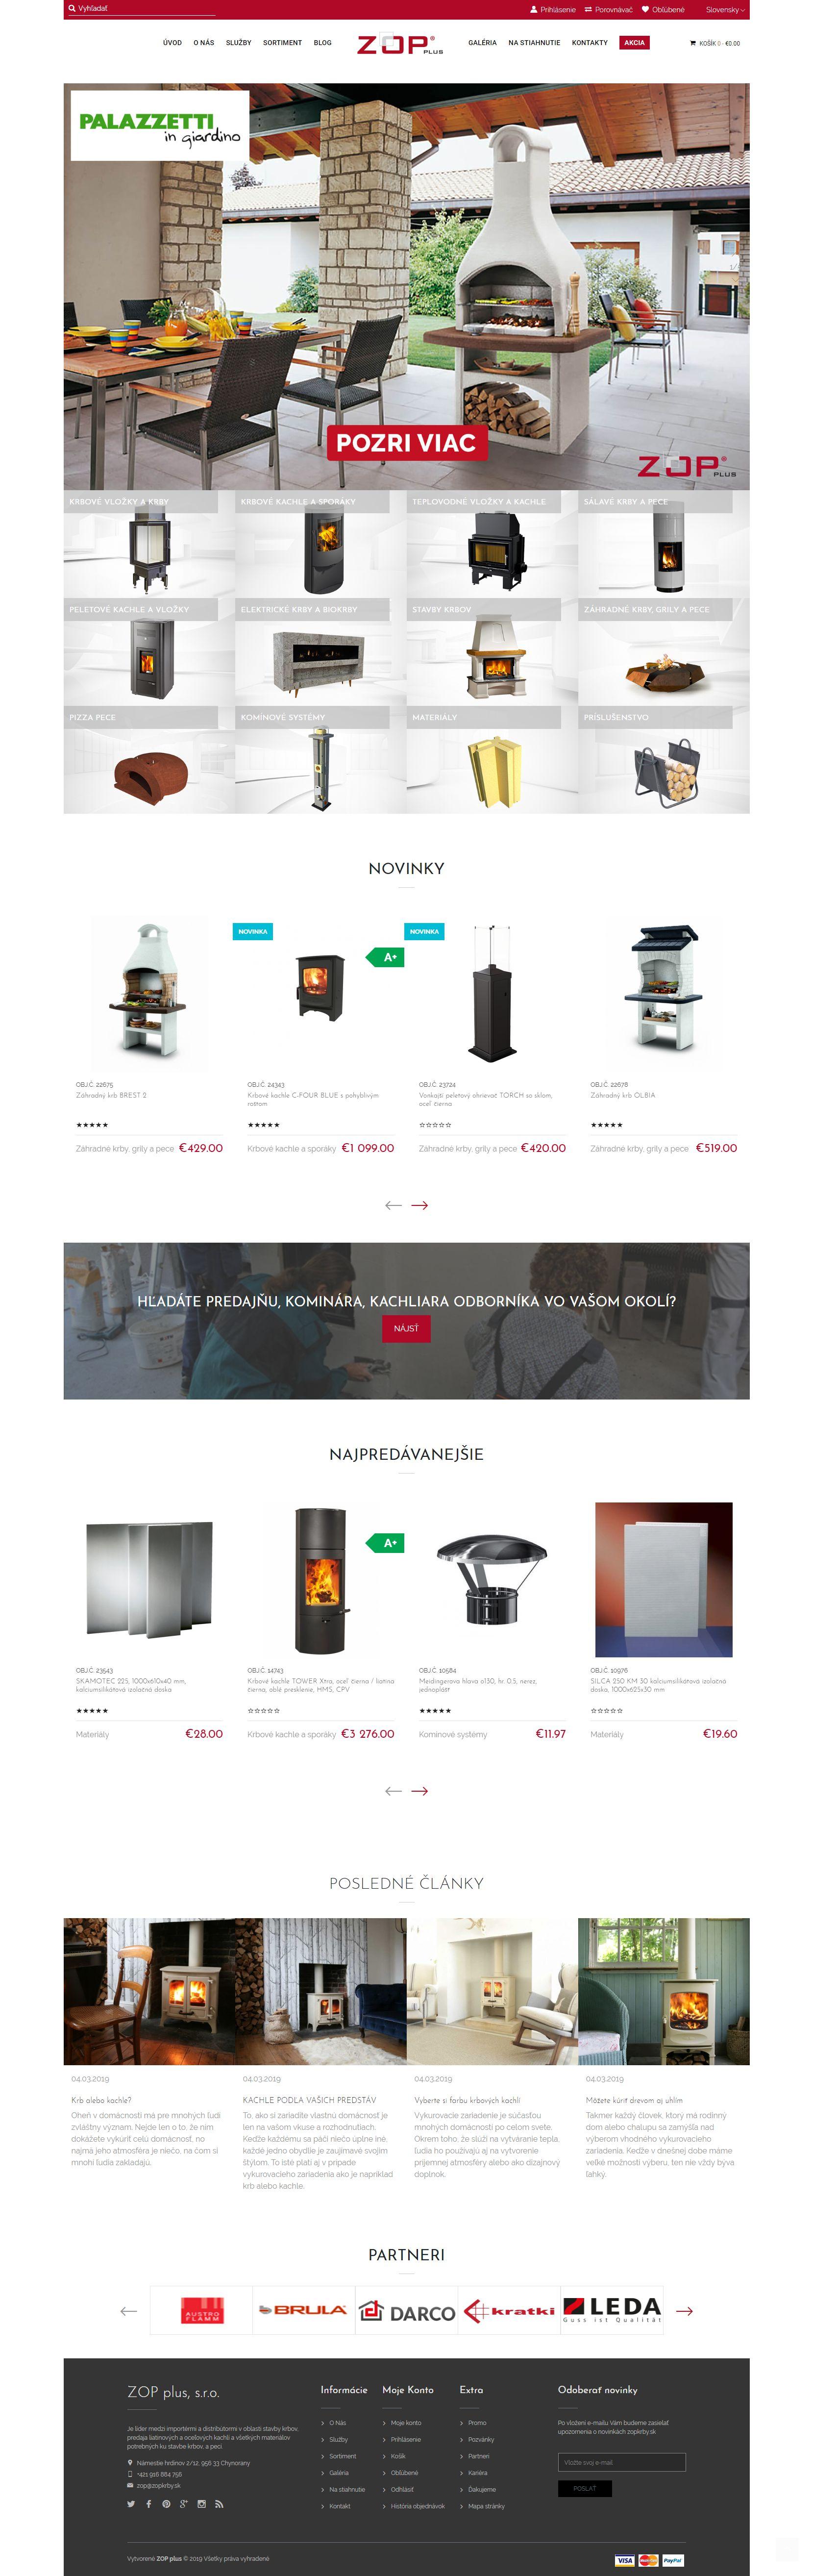 web design zopkrby